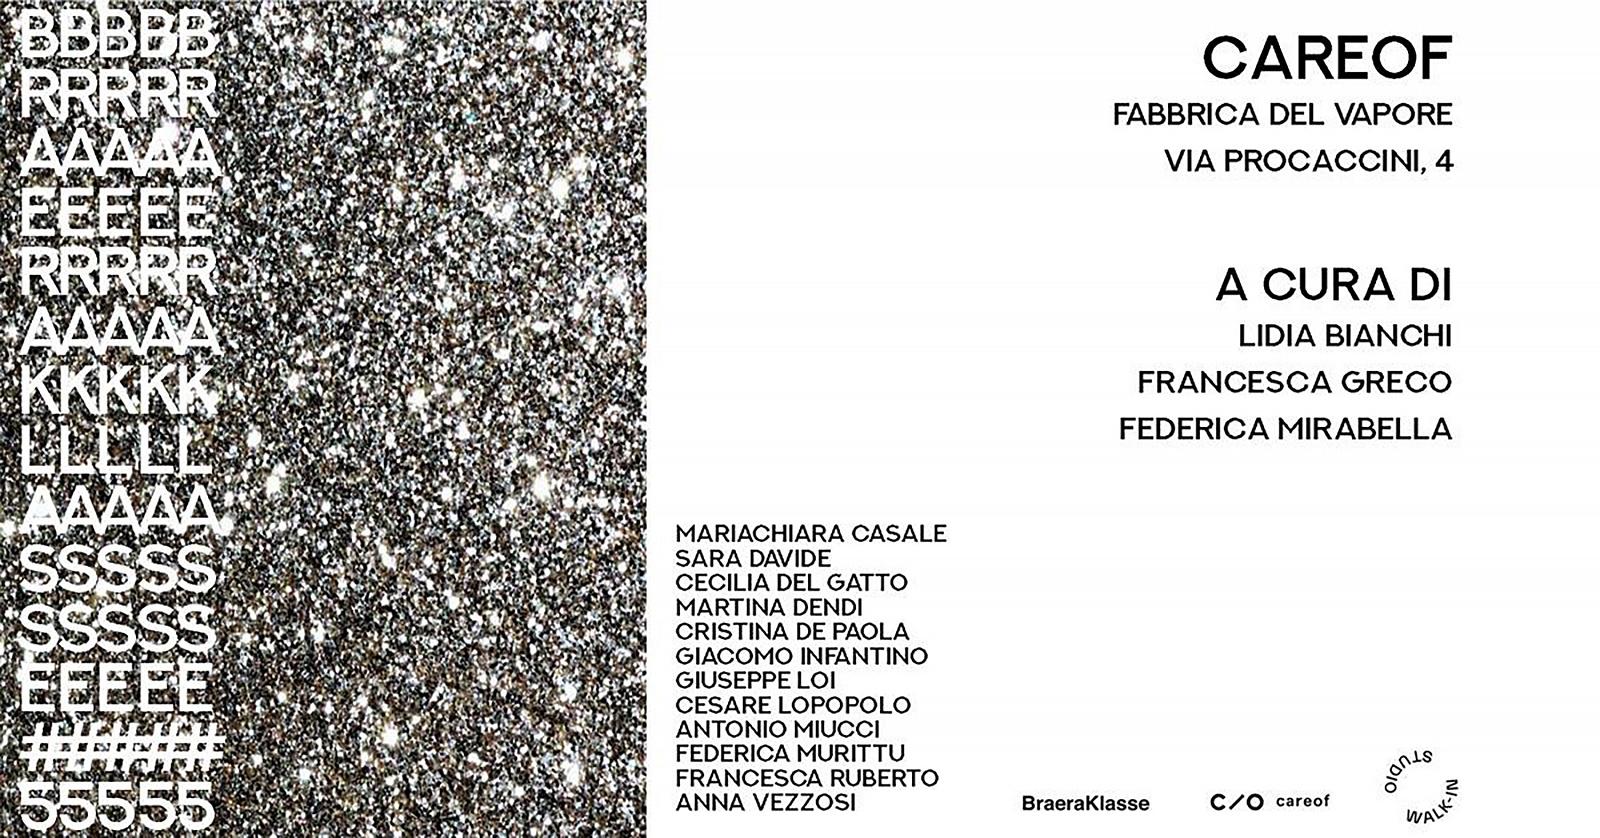 2020 – BRAERAKLASSE#5 - IPER ESTERNO INTERNO, CAREOF PROJECT / Walk In Studio, Fabbrica del Vapore, Milano - IT